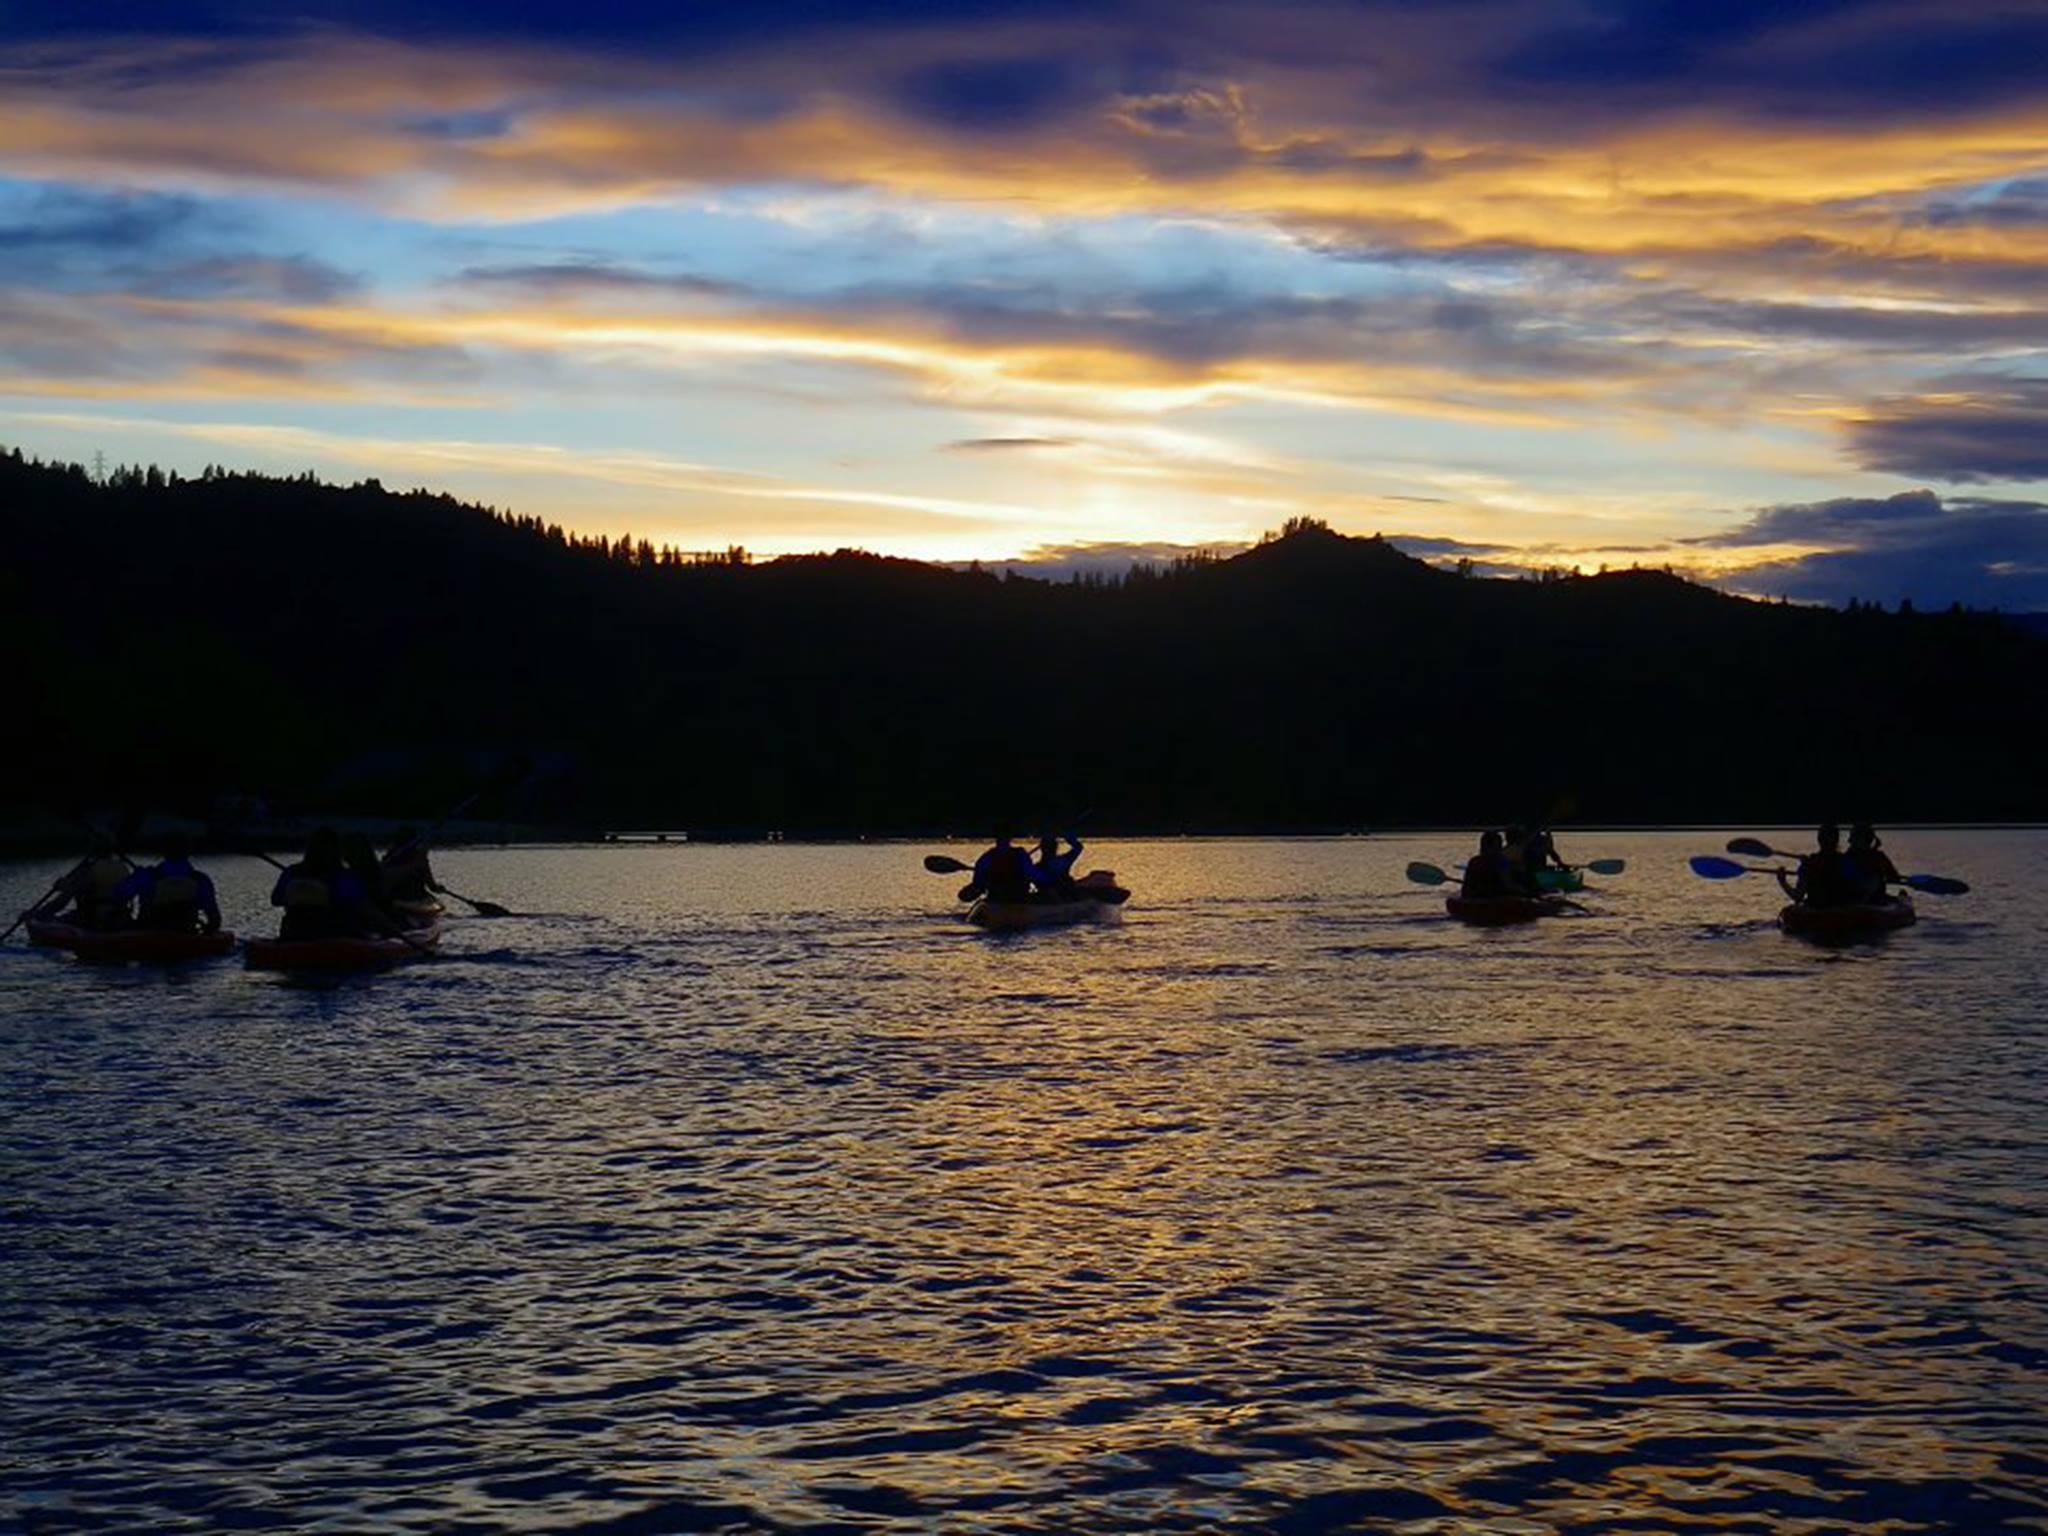 The Moonlight Kayaking Tour Across Whiskeytown Lake In Northern California Belongs On Your Bucket List